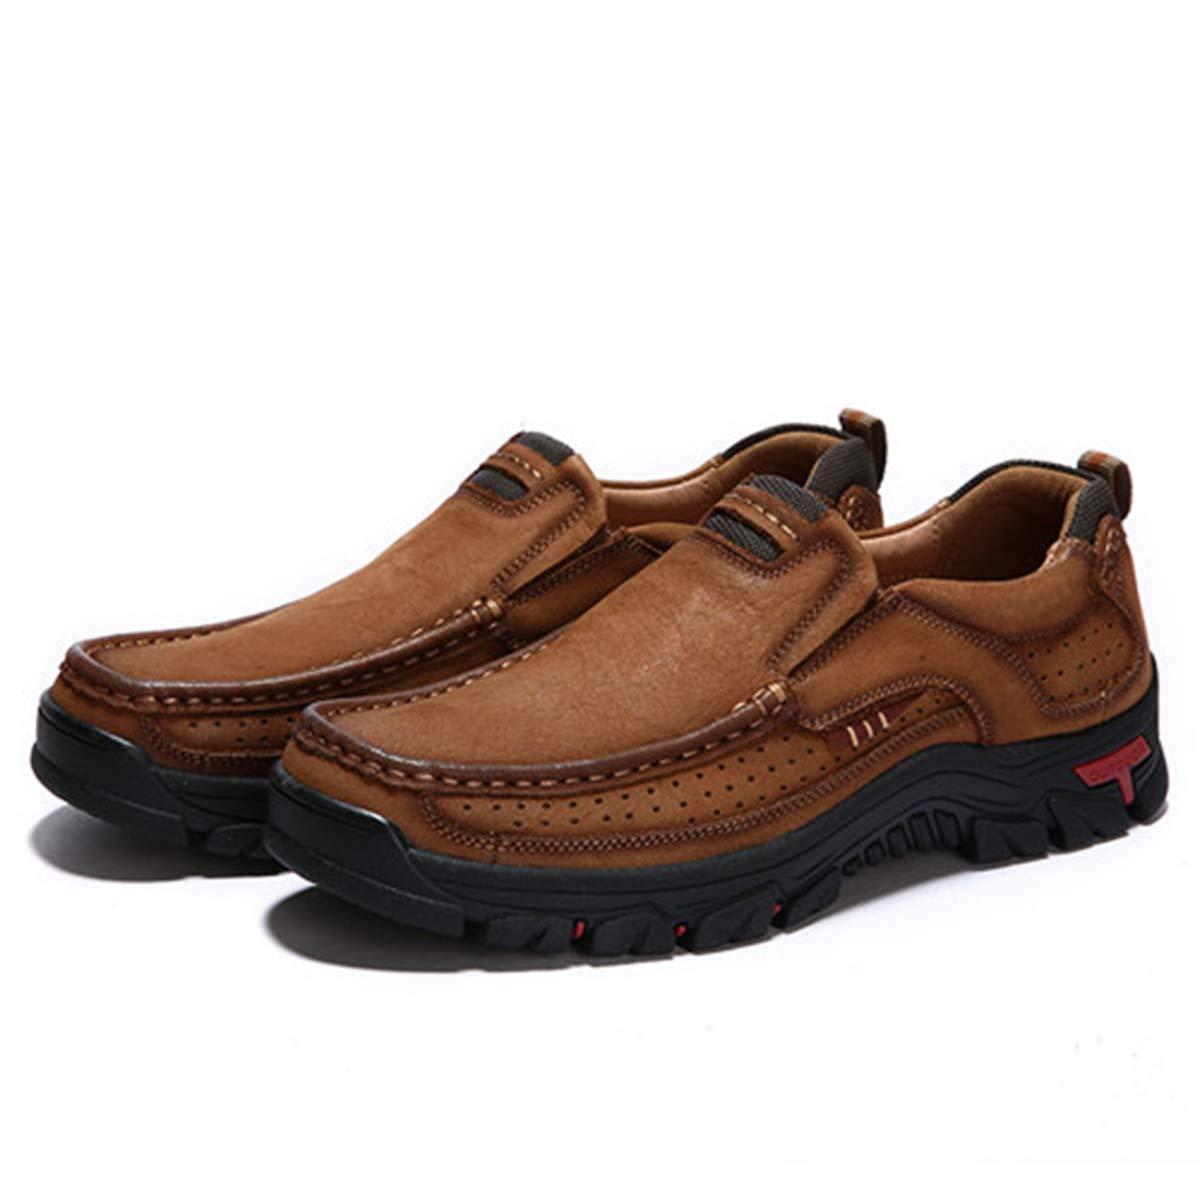 - Genuine Leather schuhe Men Cow Leather Casual Casual schuhe Male Outdoor Men Flats Slip-on Man Footwear Größe 38-48 Light braun 47  günstig neu kaufen